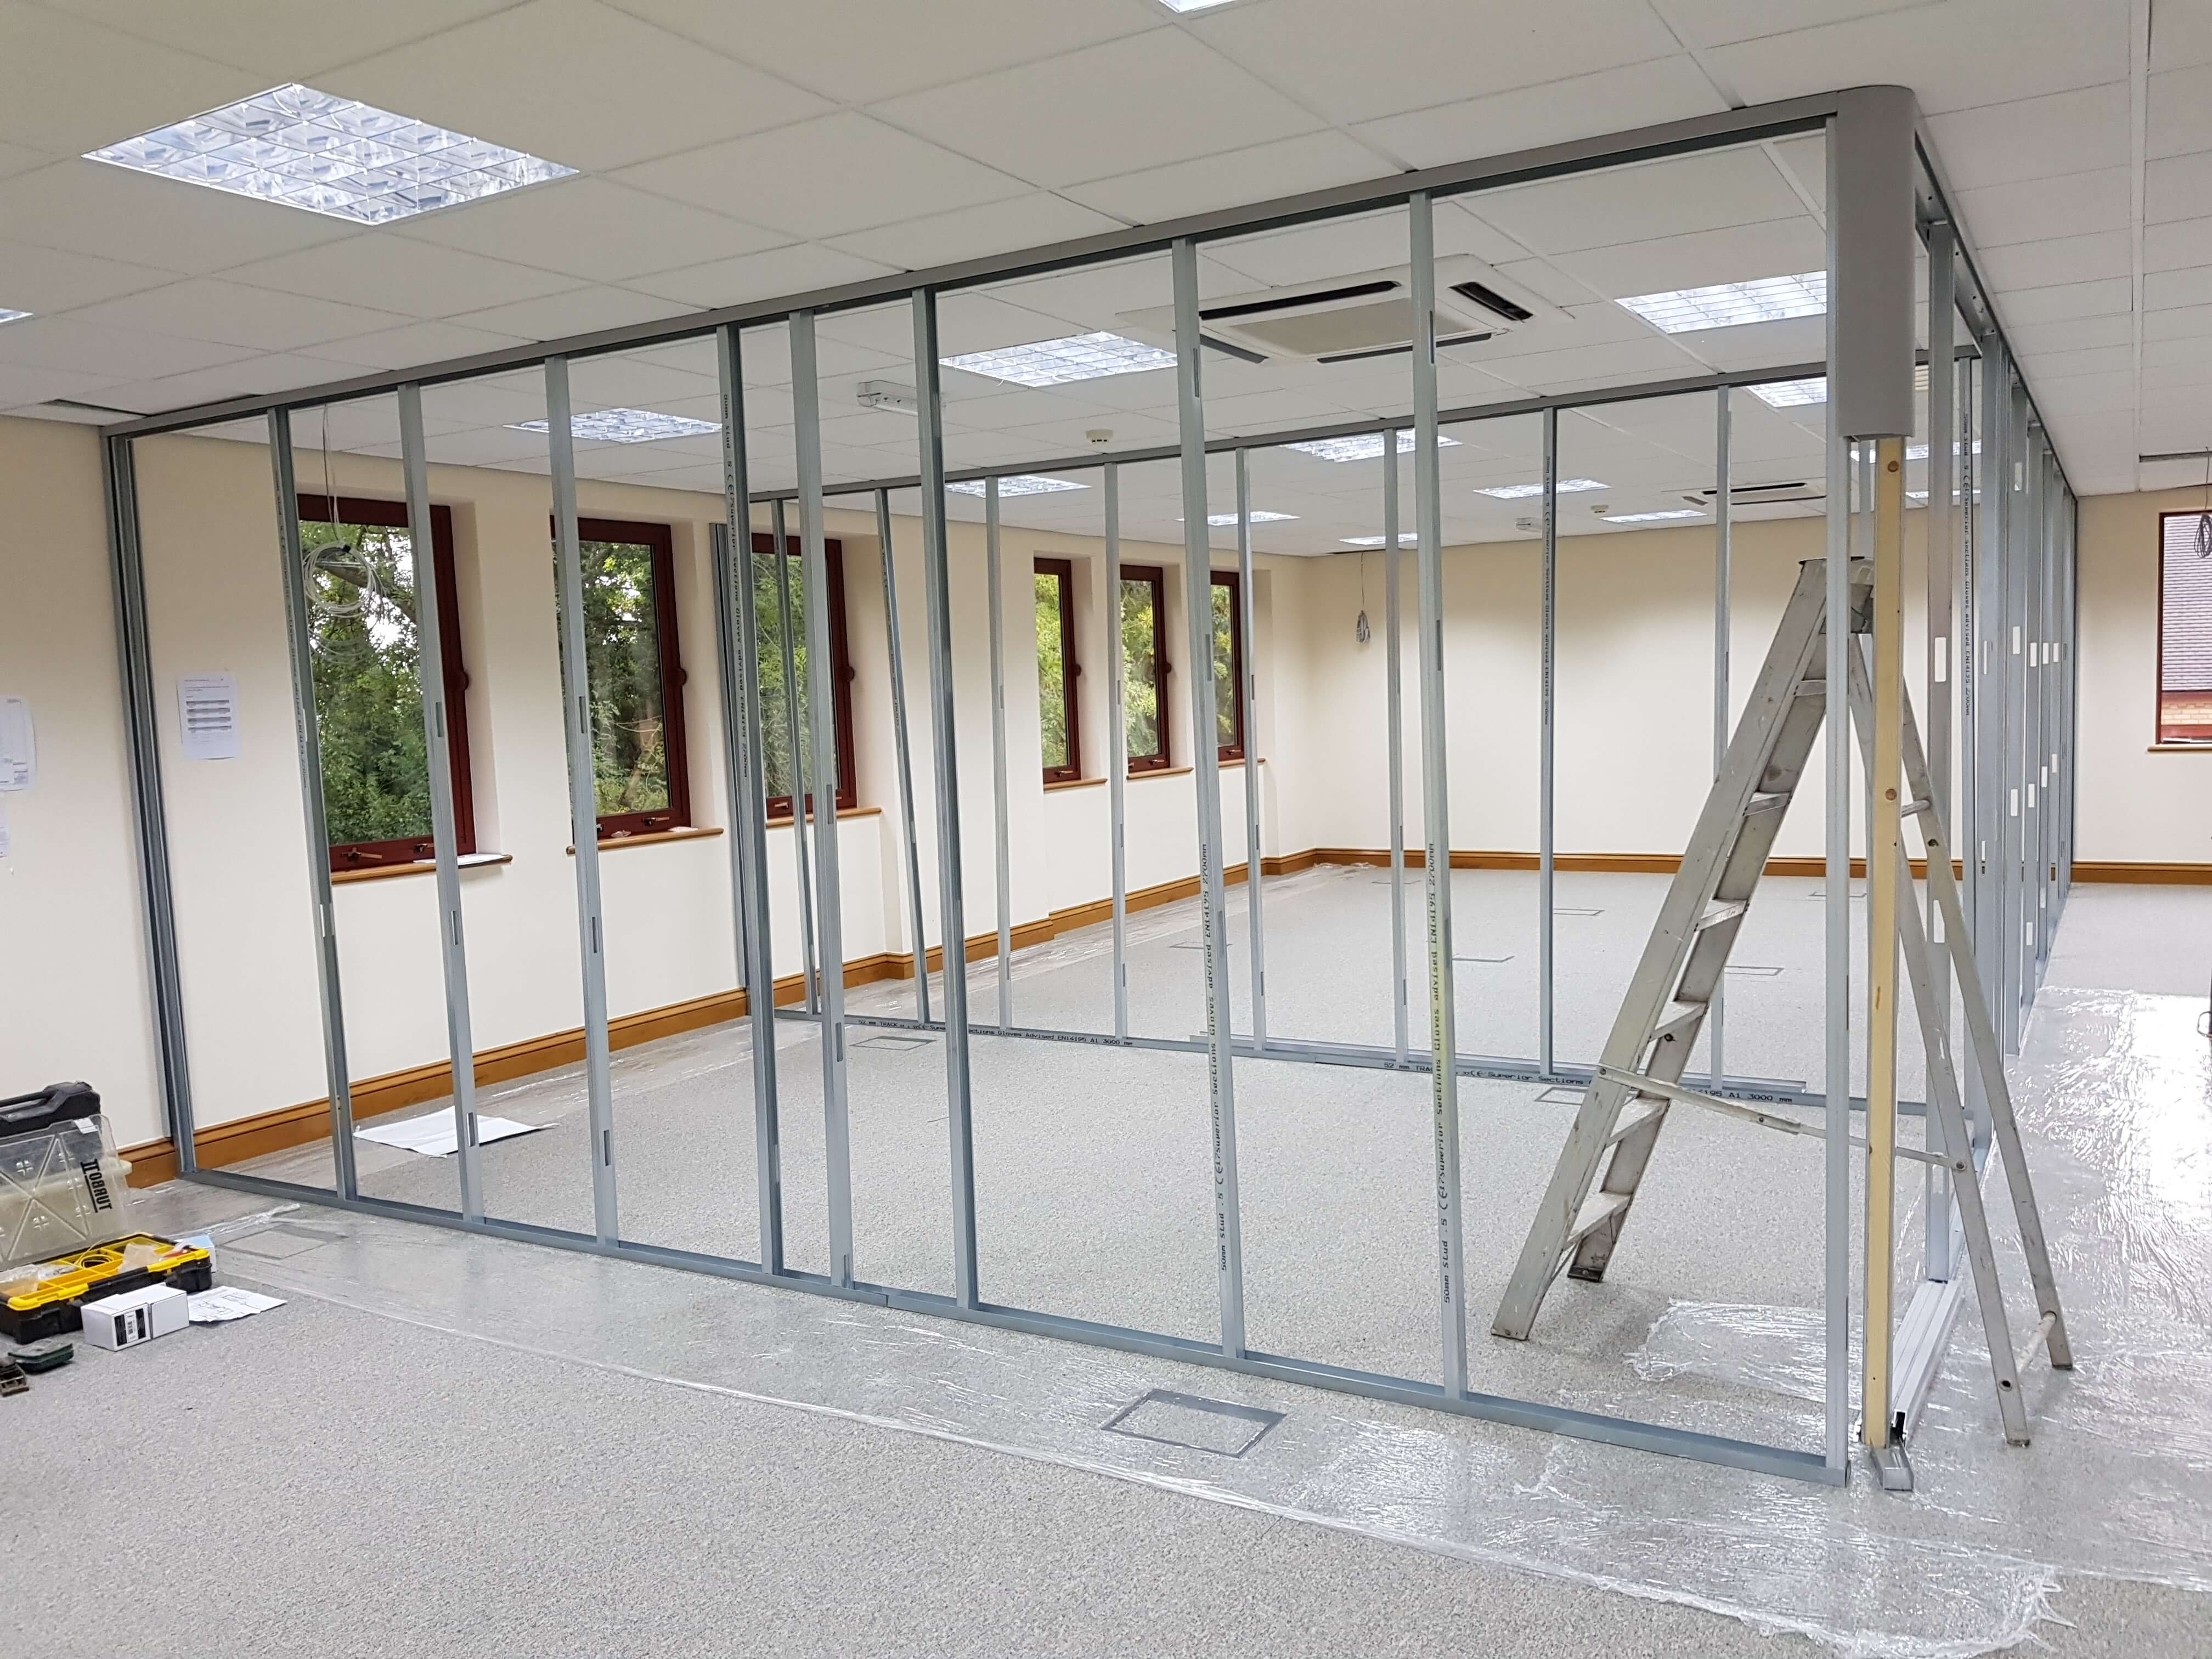 Demountable partitioning frames up